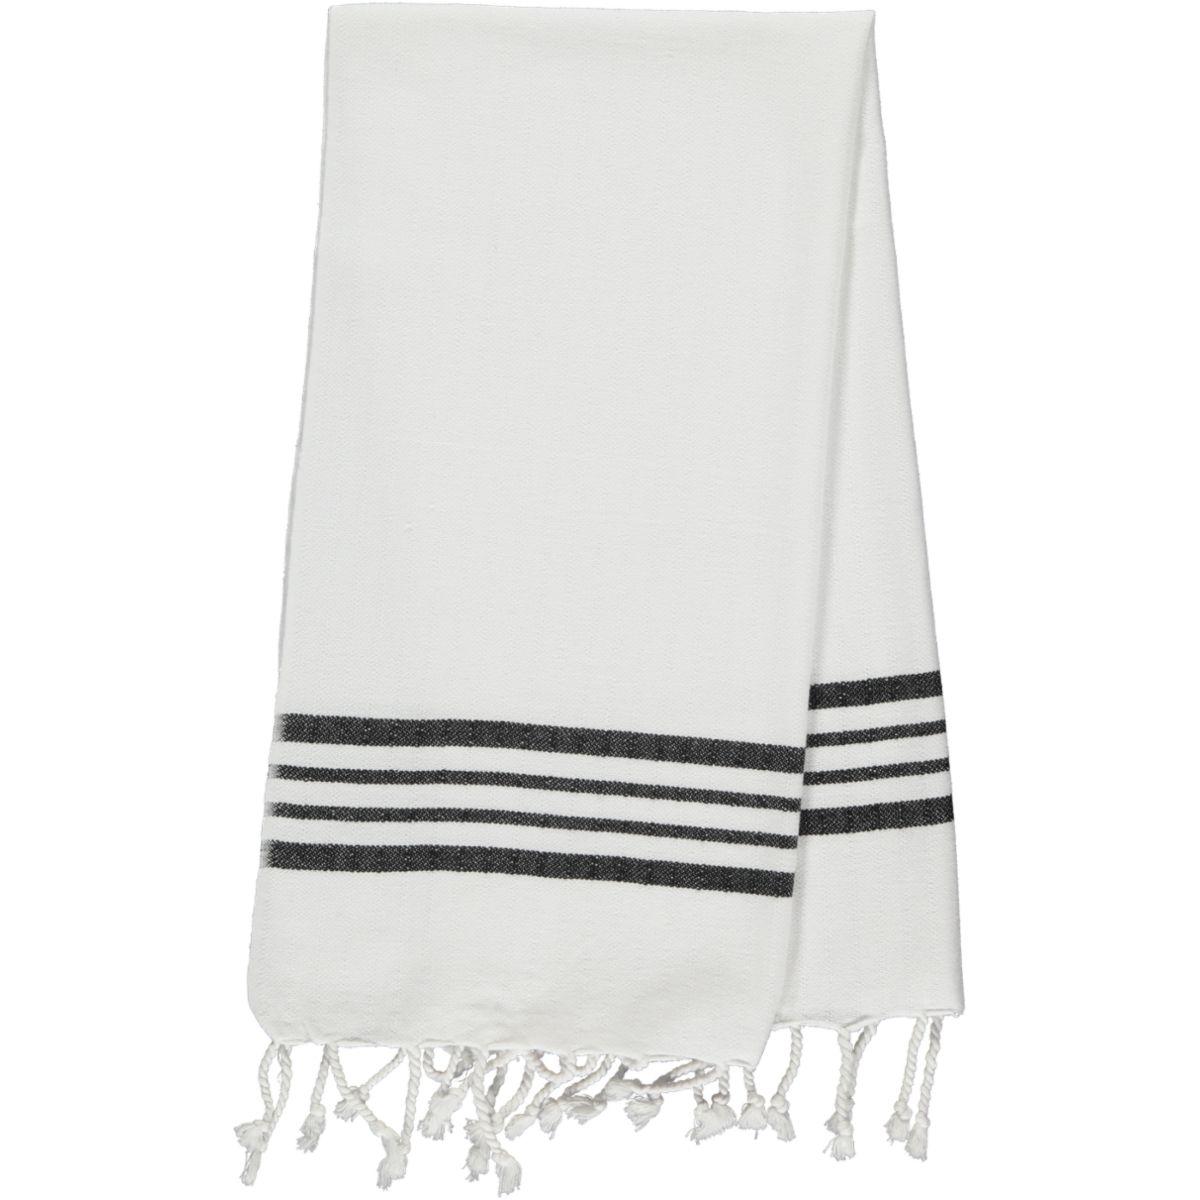 Peshkir - White Sultan / Black Stripes